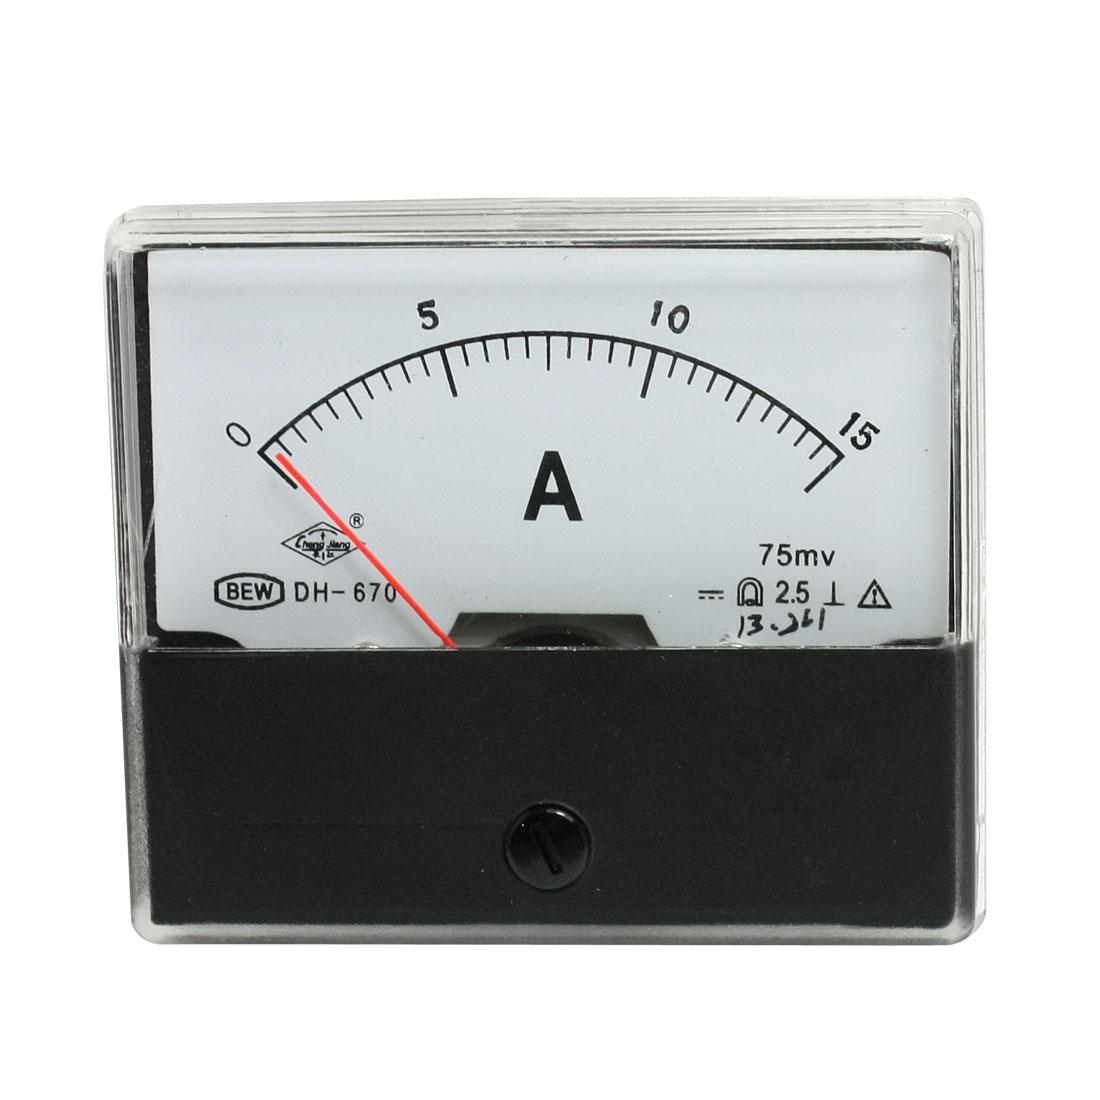 DH670 Plastic Case DC 0-15A Analog Ammeter Current Panel Meter Gauge Tool